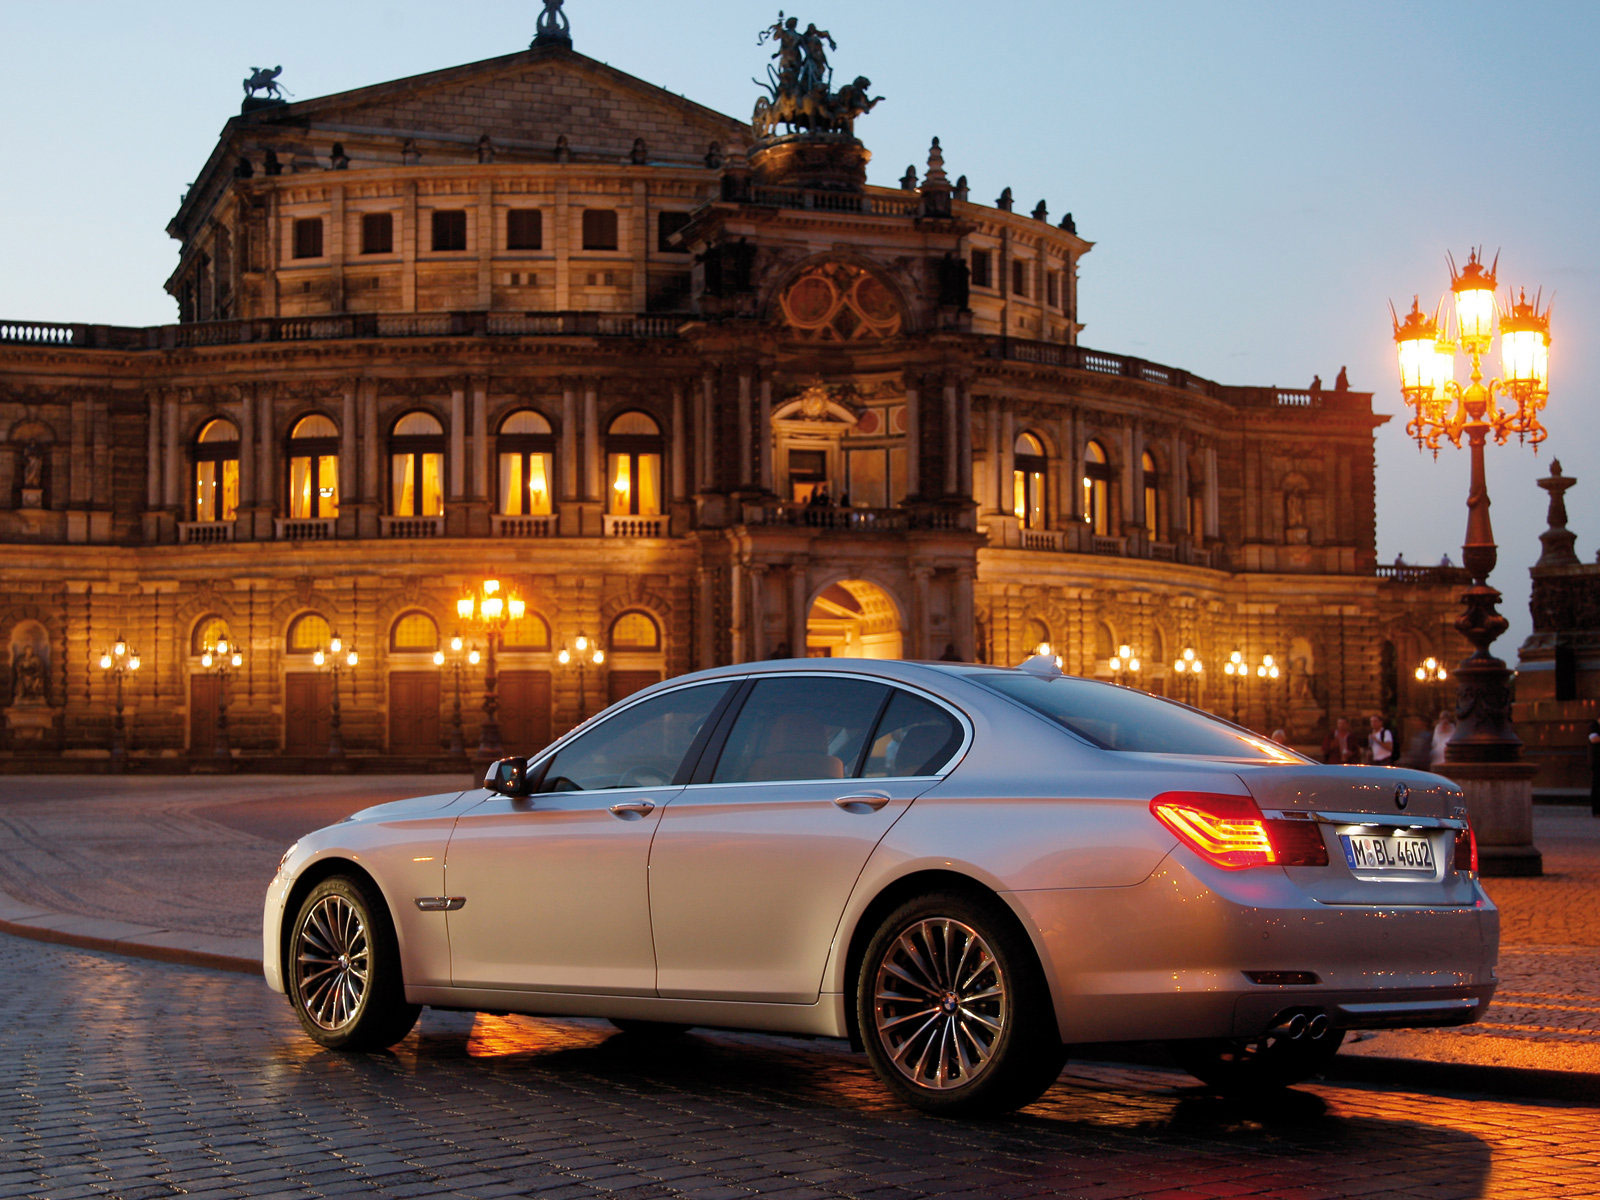 Gambar Mobil BMW | 2009 BMW 730d